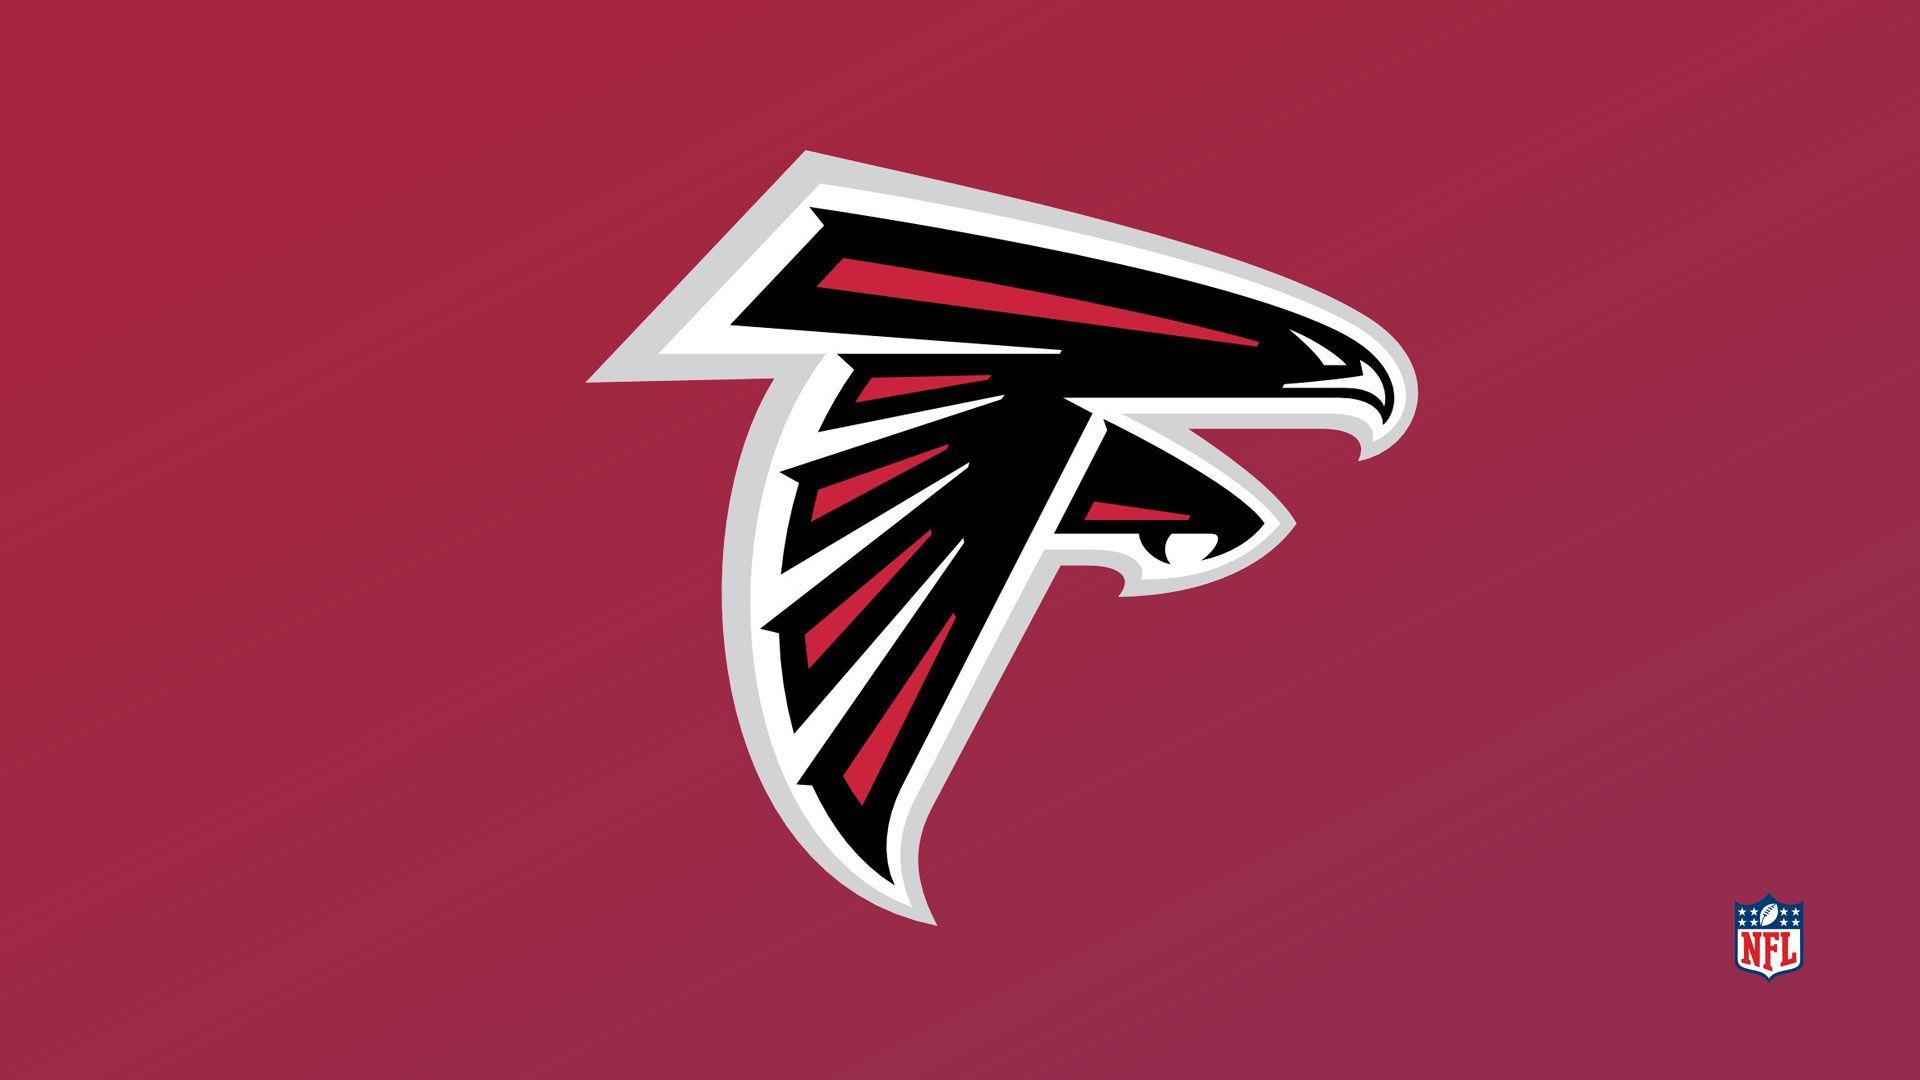 Football Falcons 1920x1080 1920x1200 1600x1200 Green Bay Packers Wallpaper Atlanta Falcons Logo Atlanta Falcons Man Cave